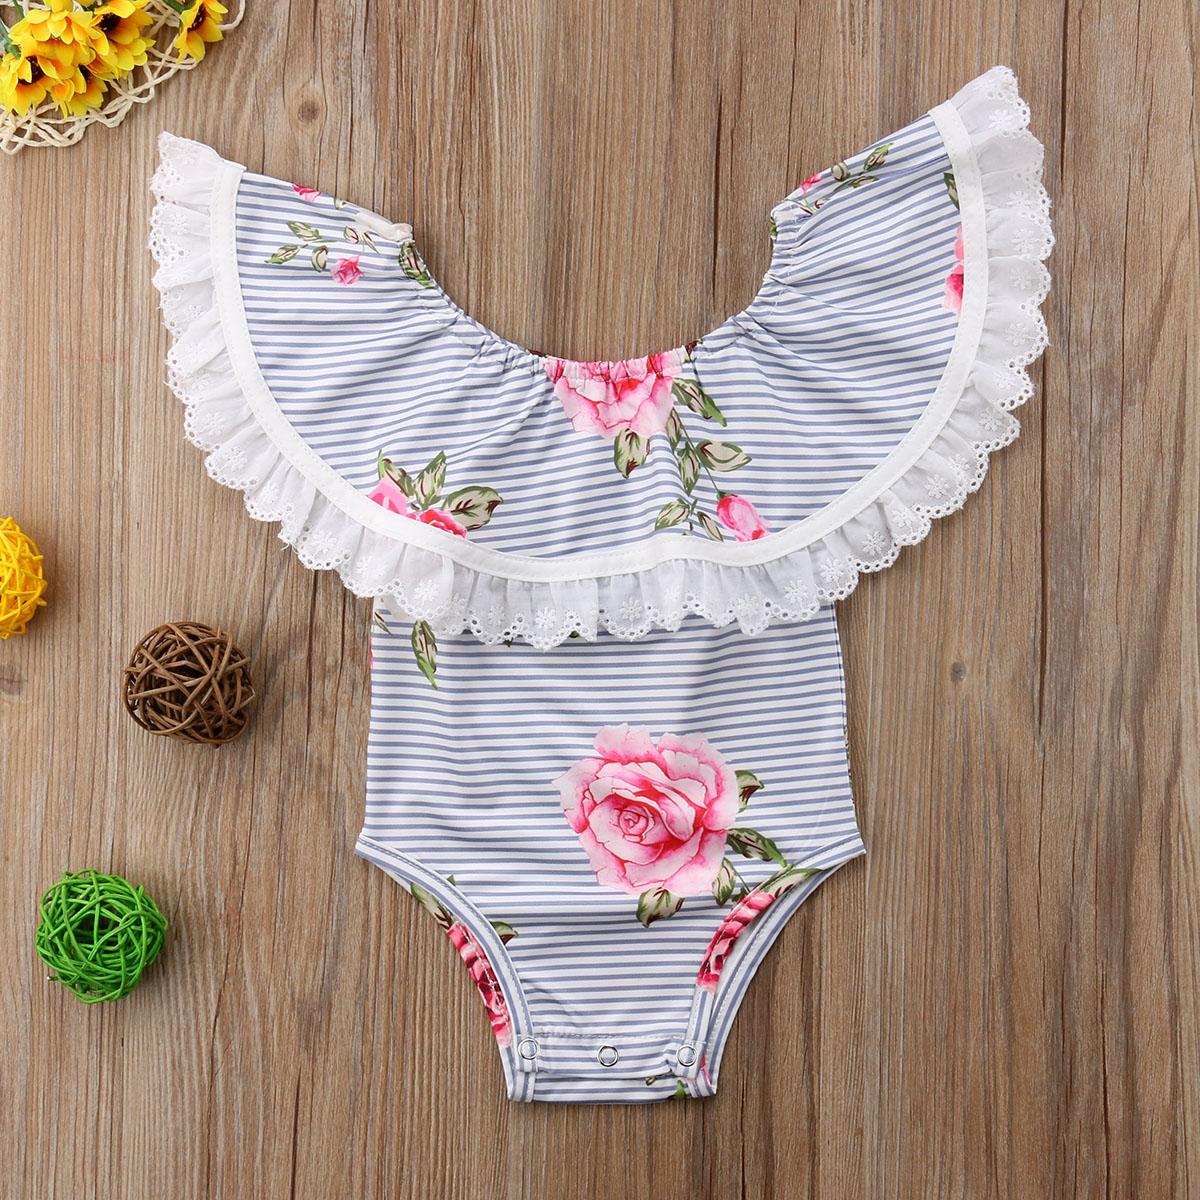 Newborn Infant Toddle Baby Girls Floral Lace Striped Jumpsuit Bodysuit Sunsuit Playsuit Cotton Clothes Summer Baby Girl 0-24M